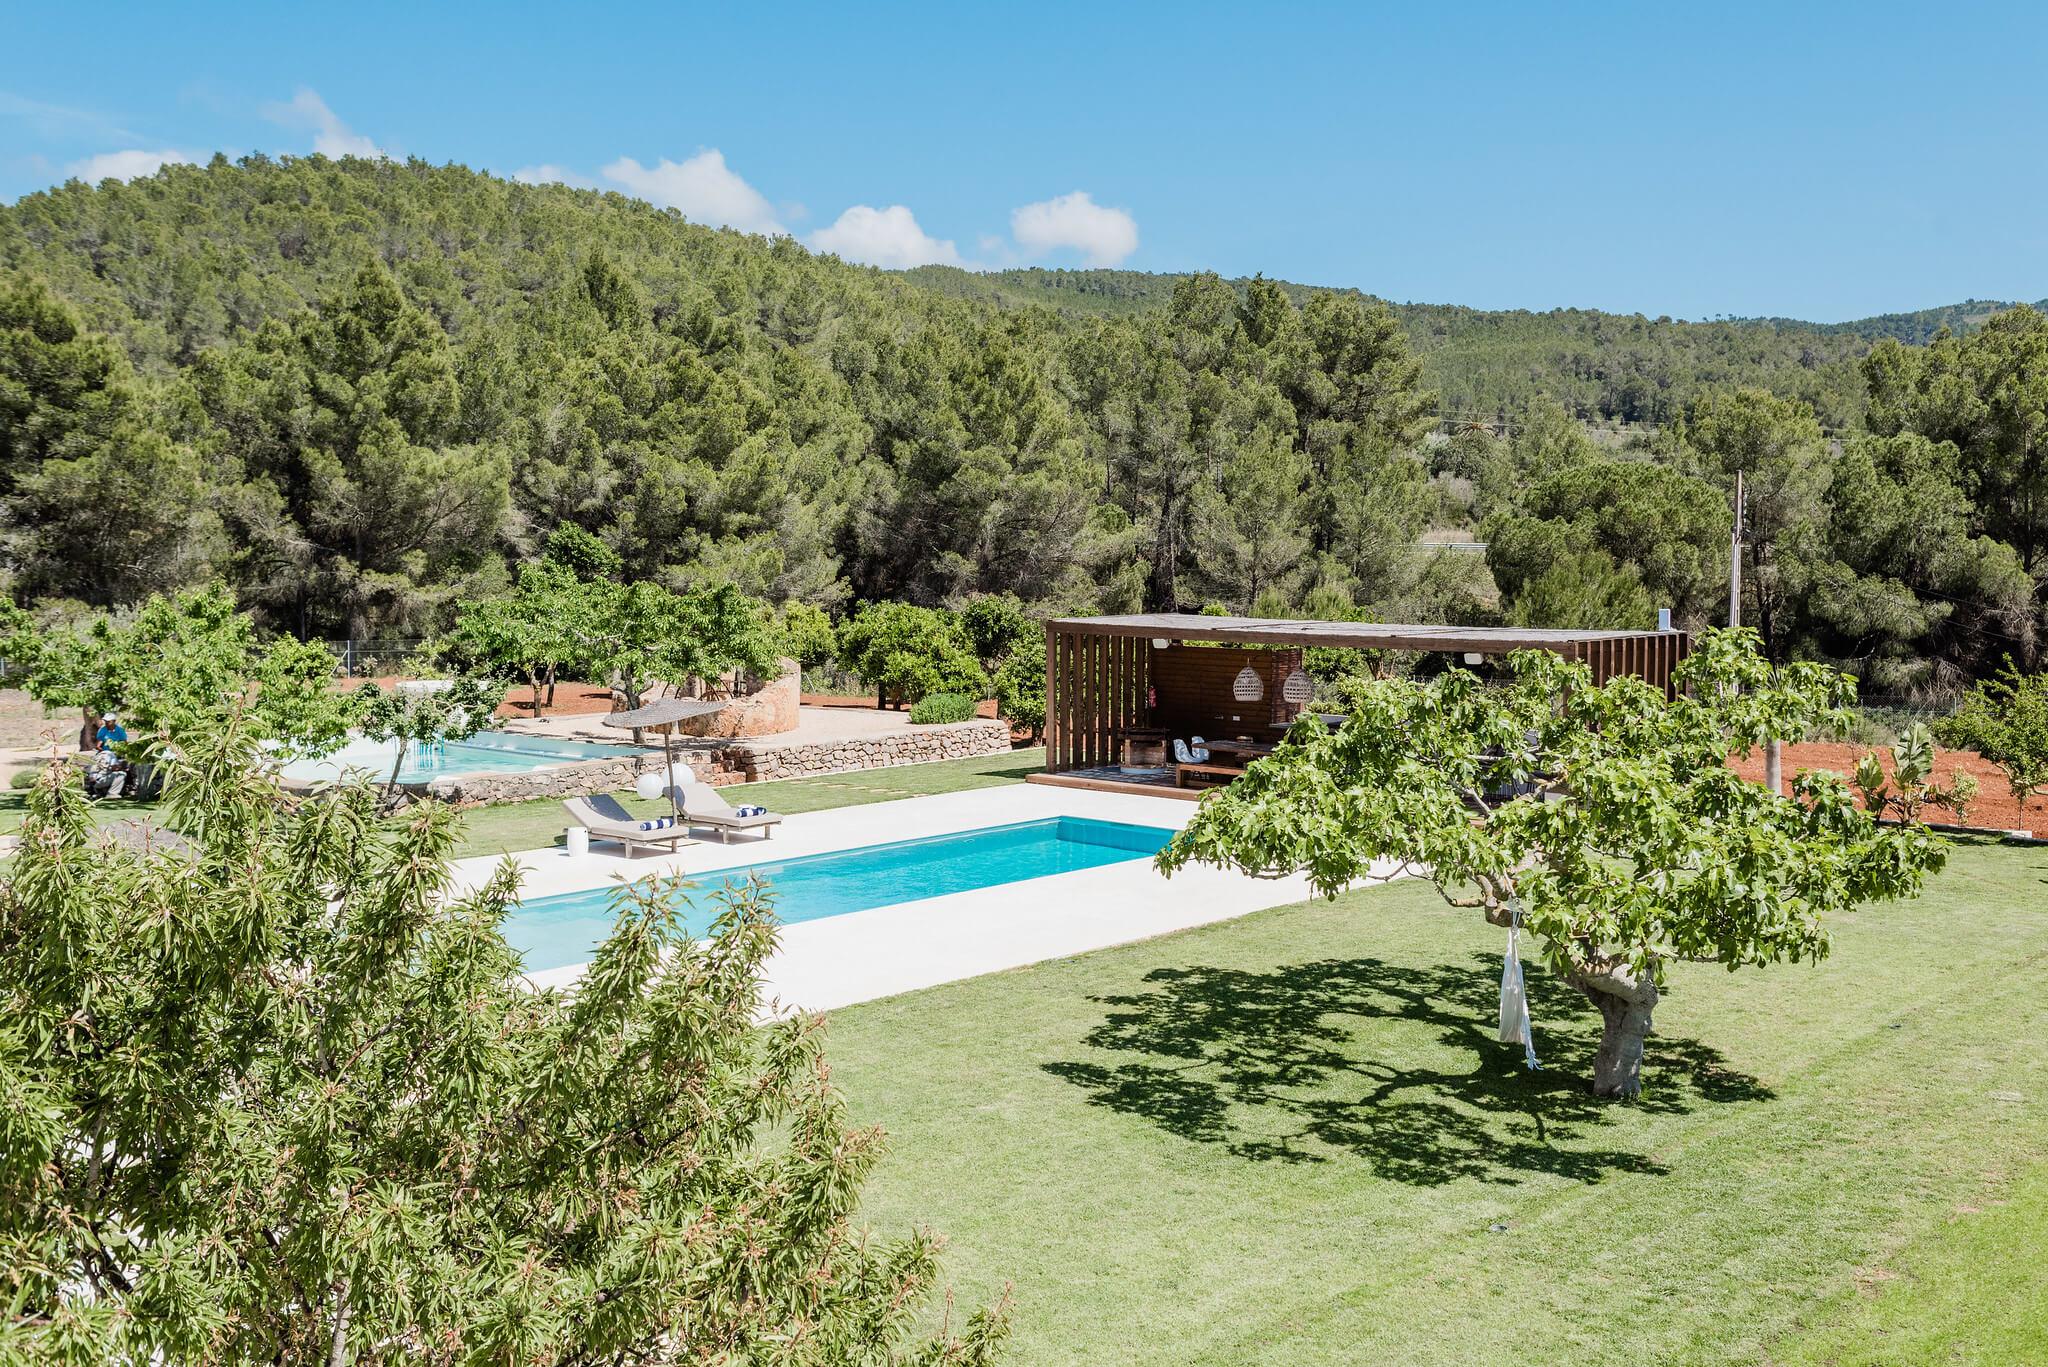 https://www.white-ibiza.com/wp-content/uploads/2020/06/white-ibiza-villas-can-carmen-exterior-garden.jpg